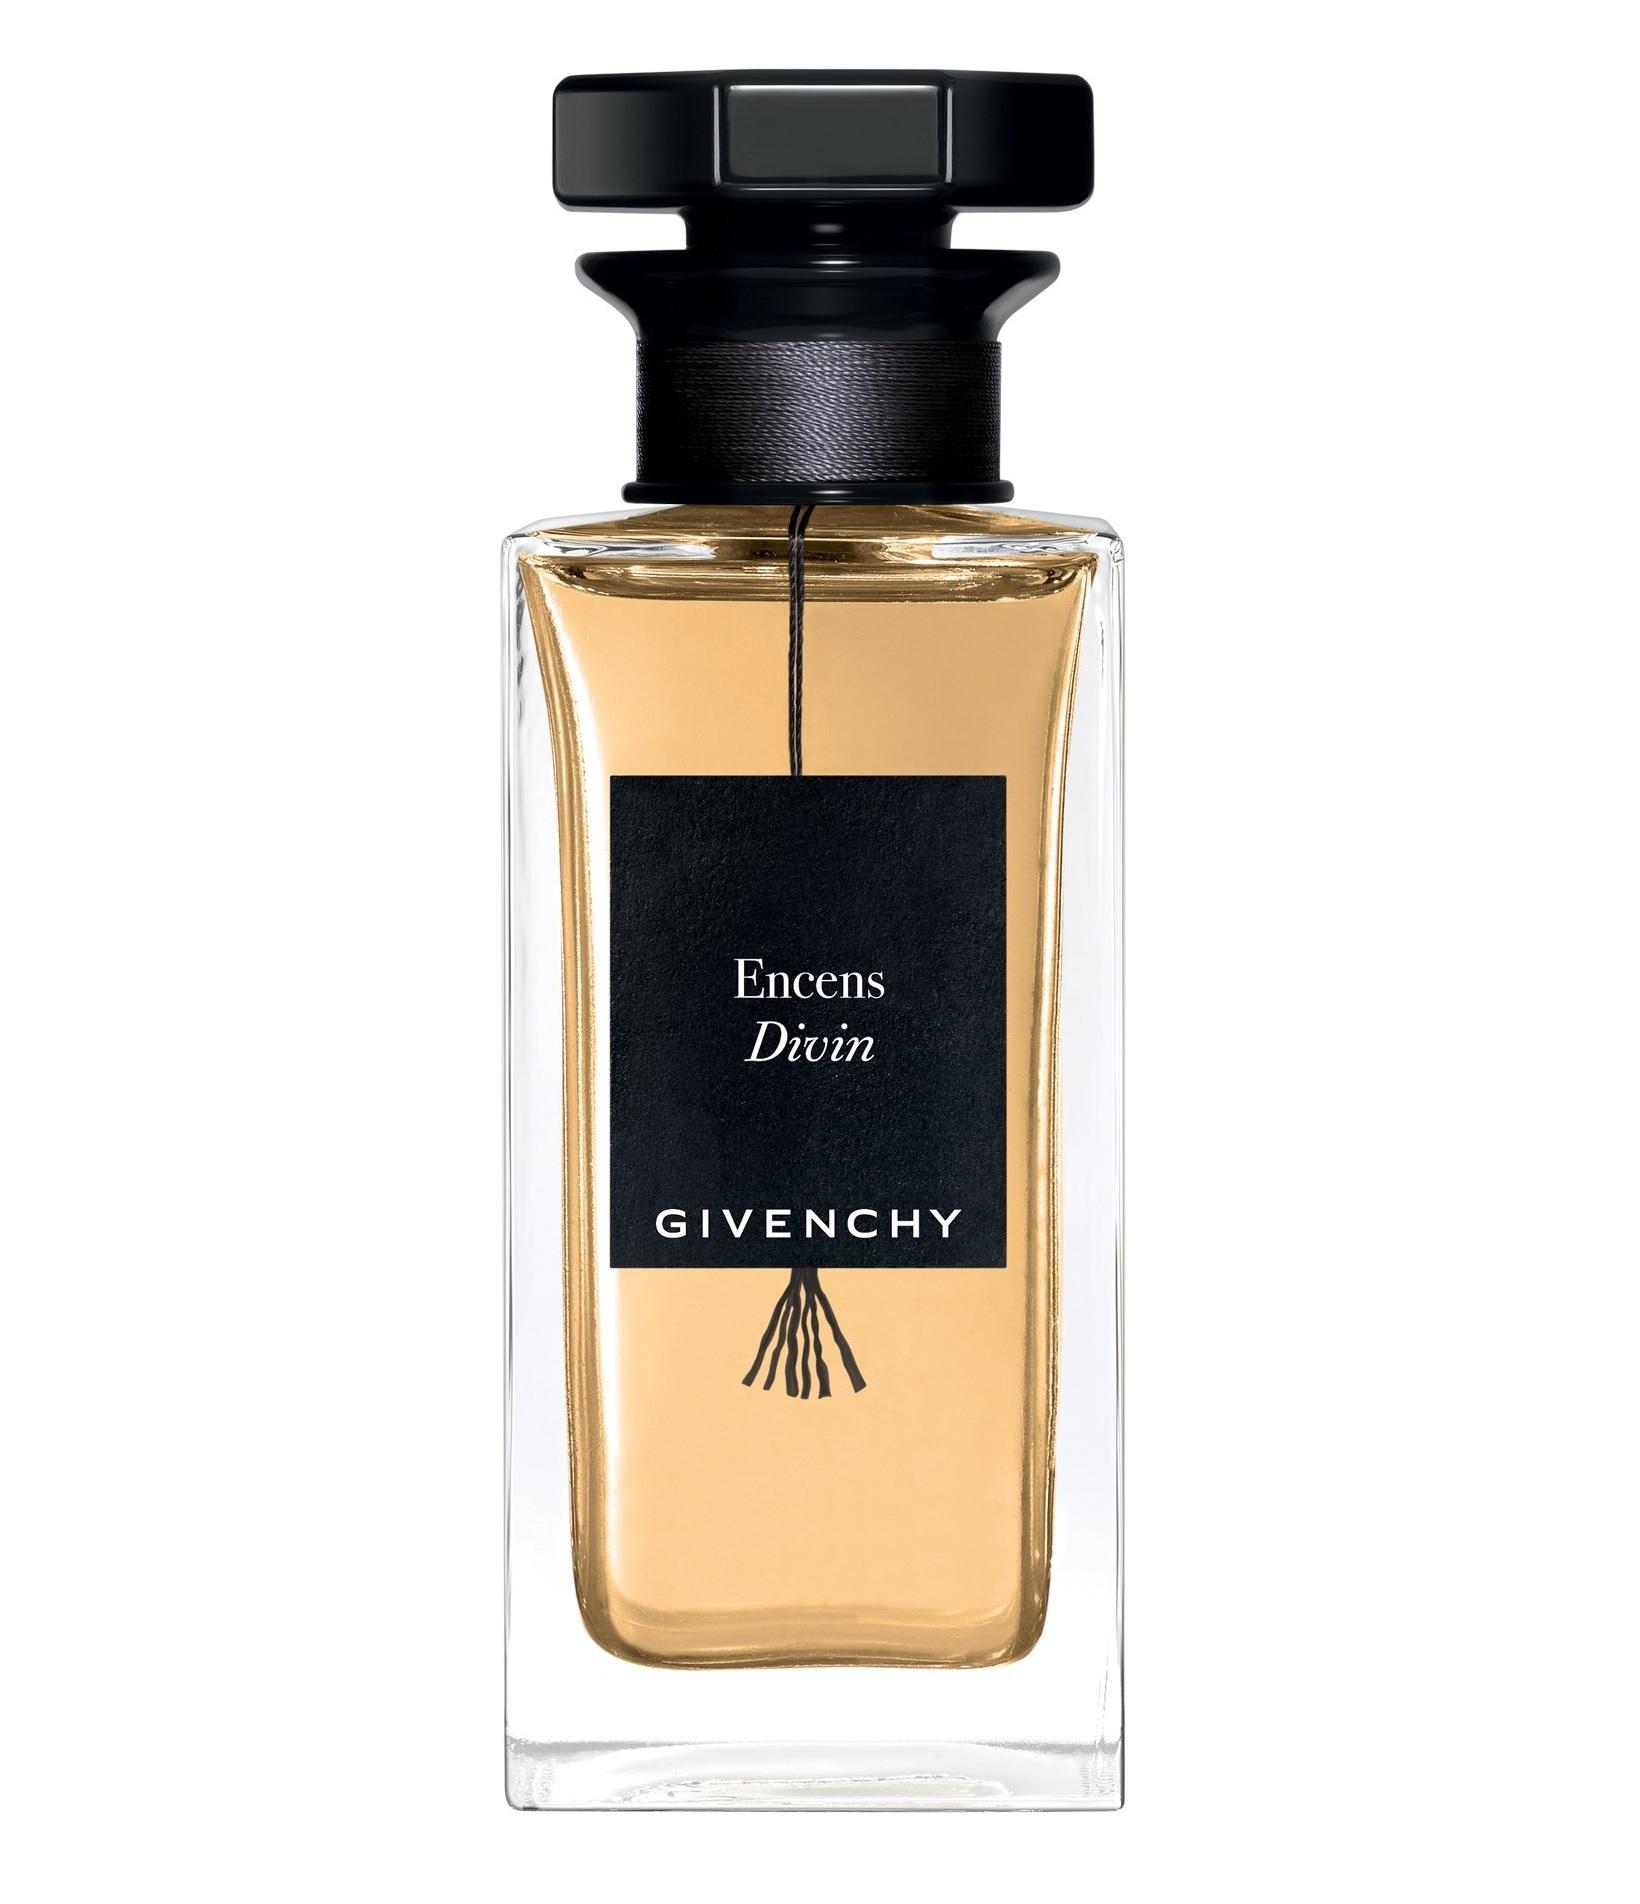 Parfums Divin Nouveaux Encens ~ Givenchy I7vfmY6gby